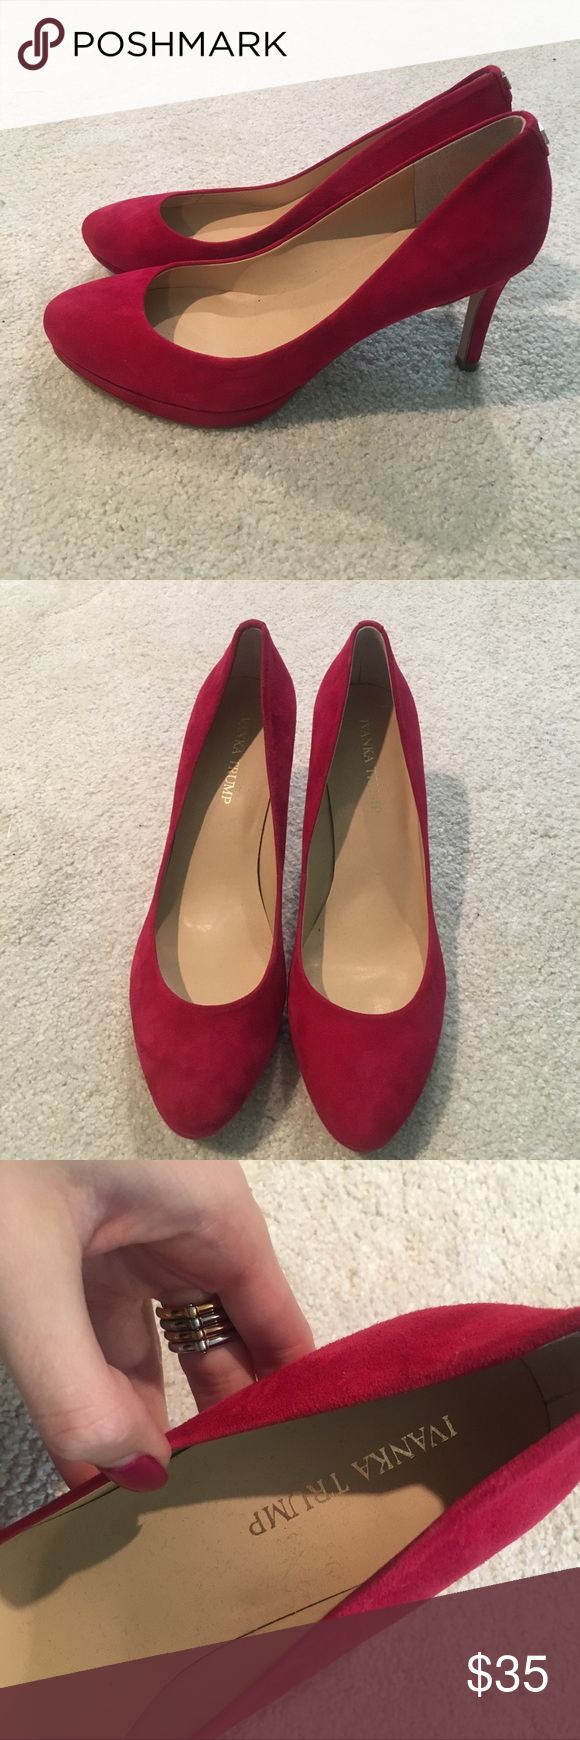 241c2b6319372 Ivanka Trump Red Heels Ivanka Trump Red Heels